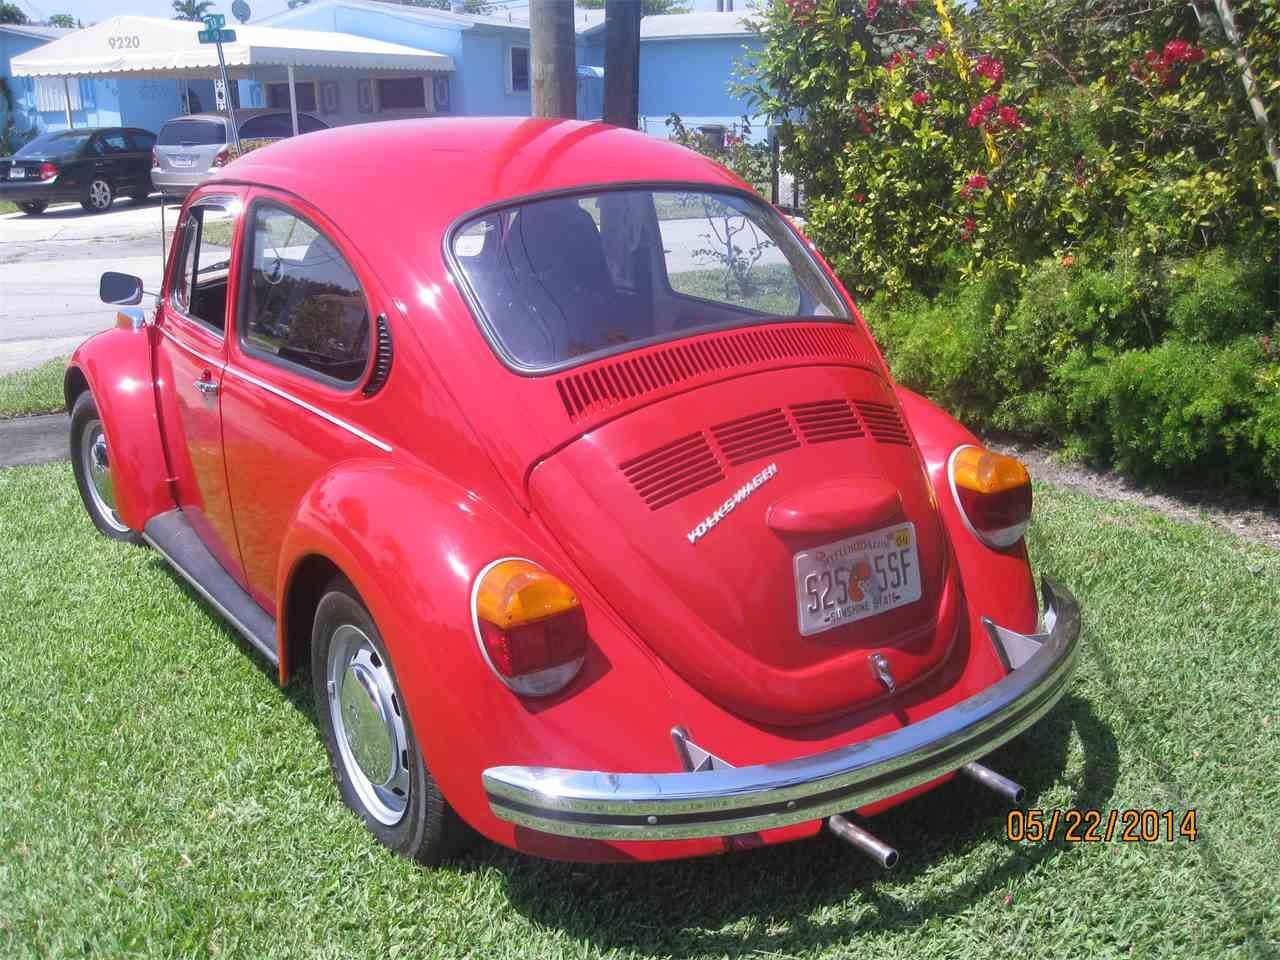 1973 Volkswagen Beetle for Sale | ClassicCars.com | CC-565681